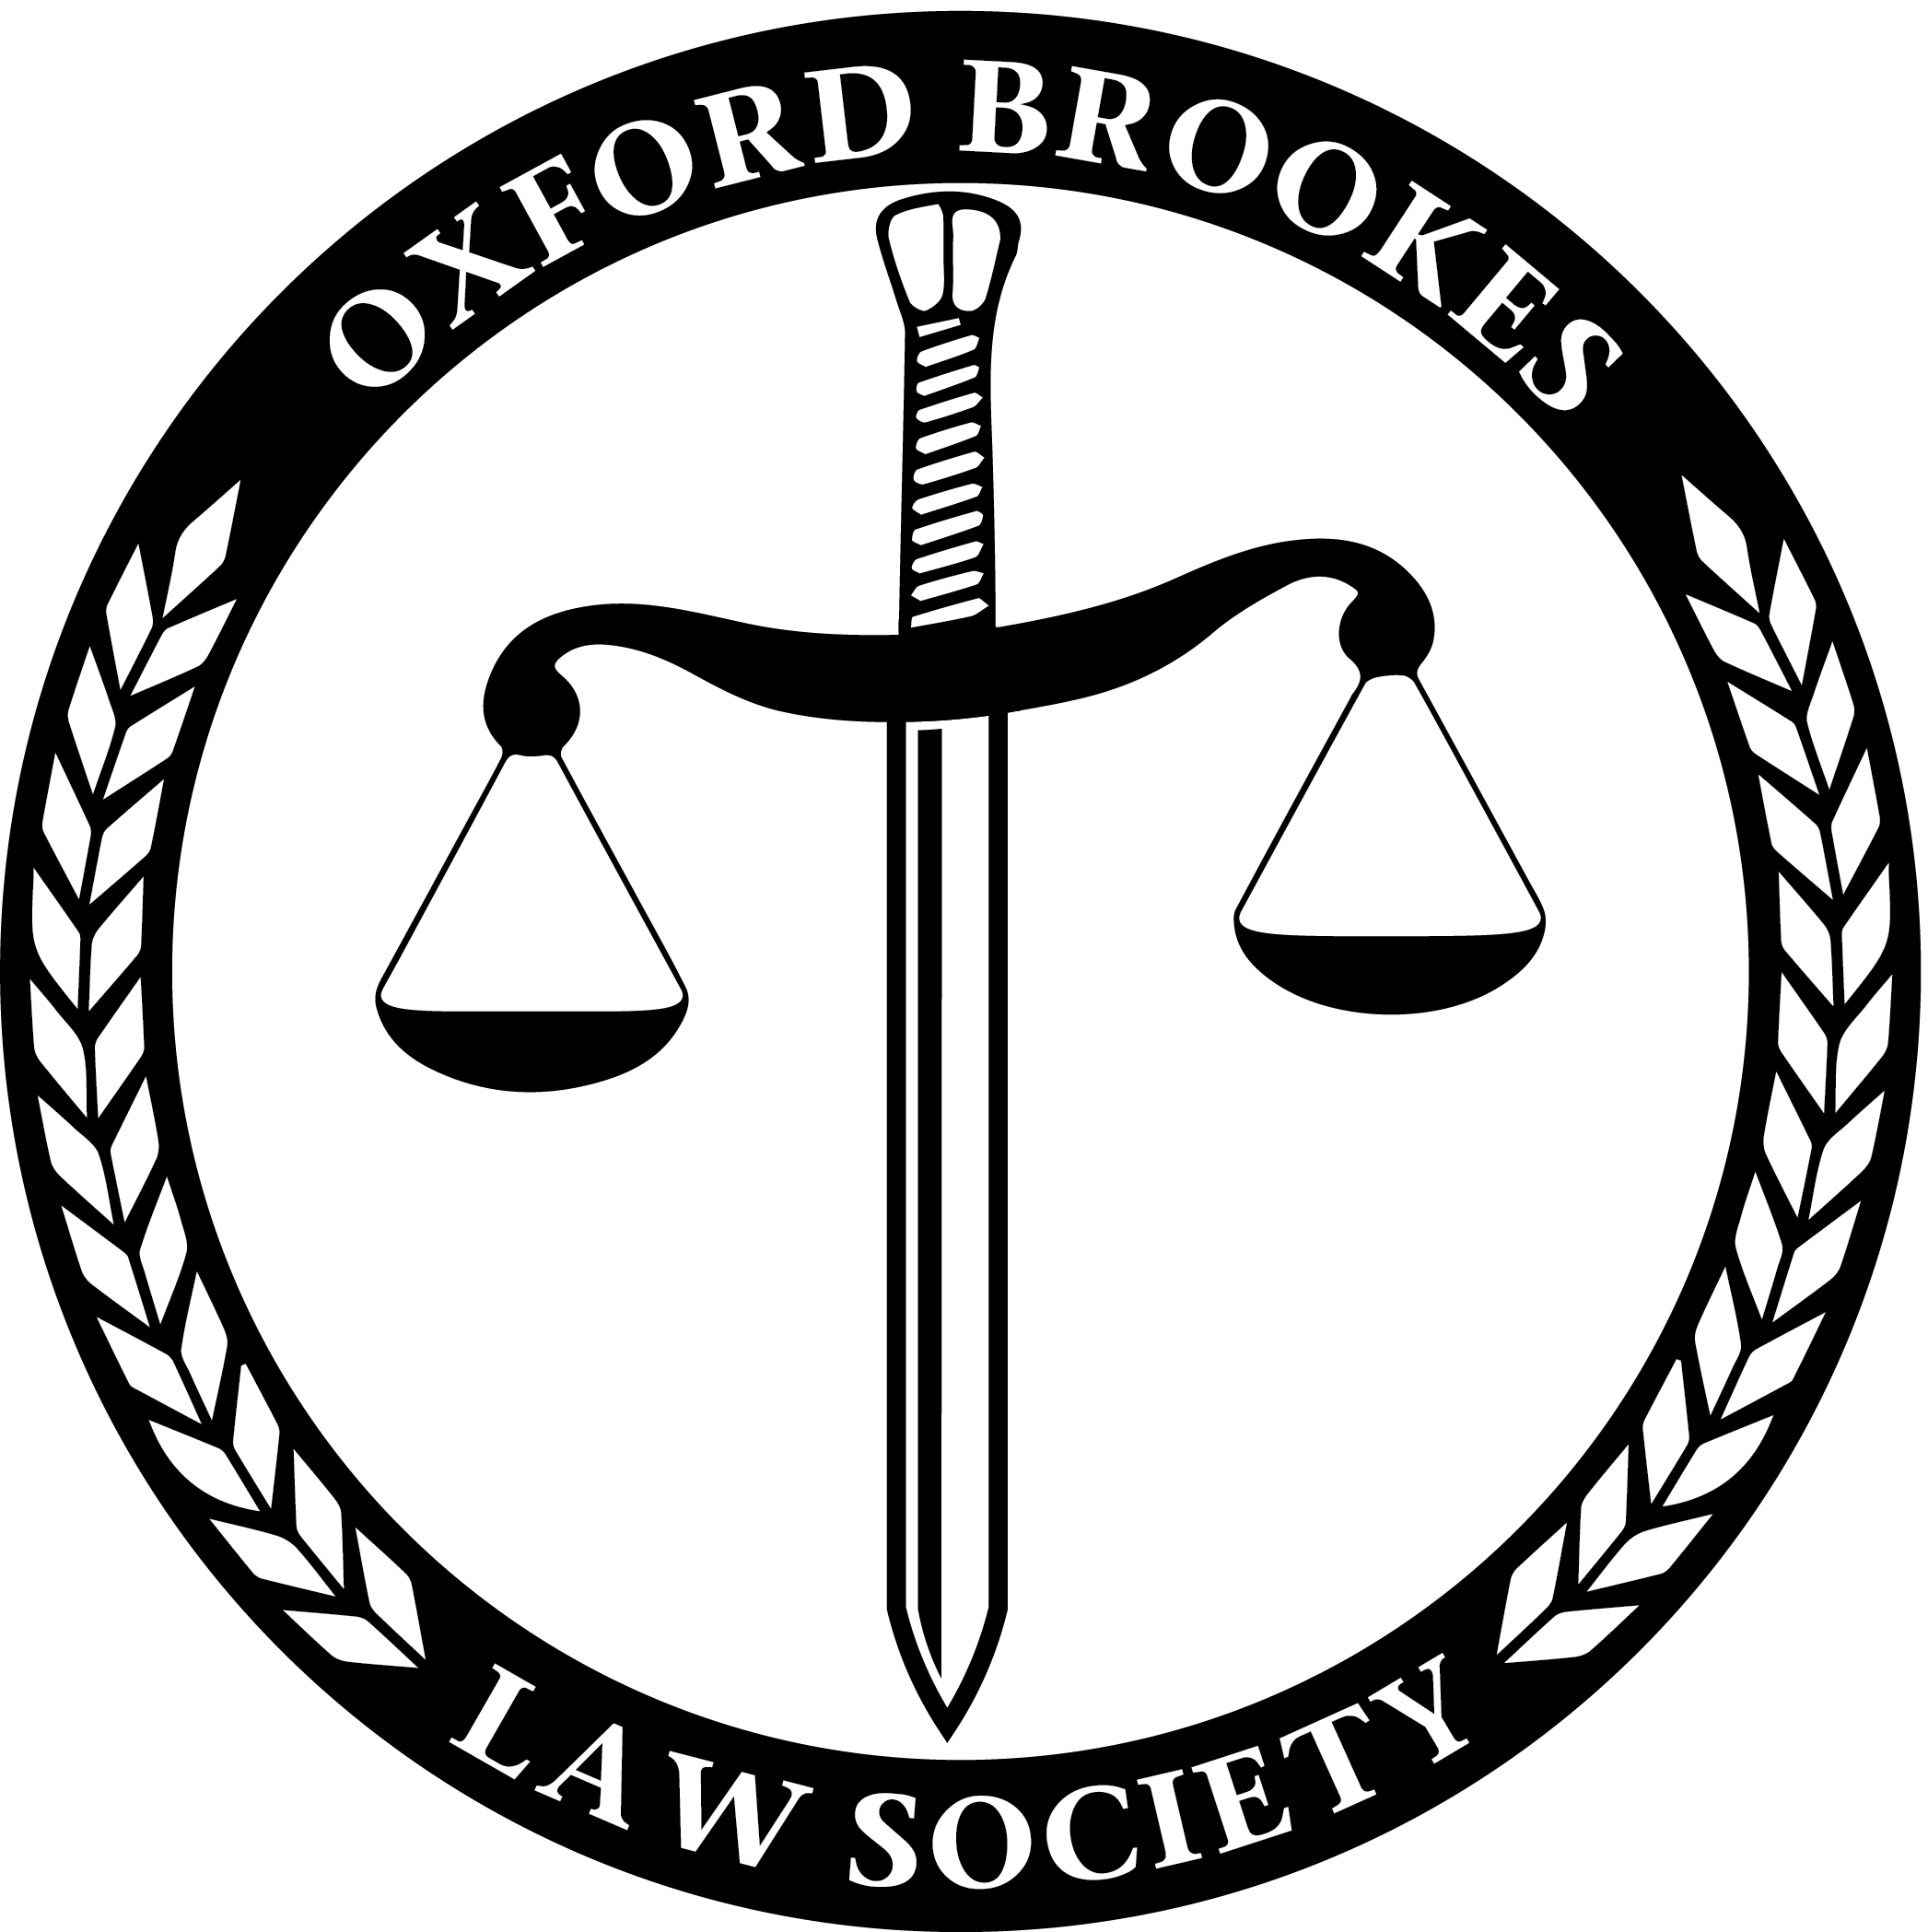 Oxford Brookes Law Society